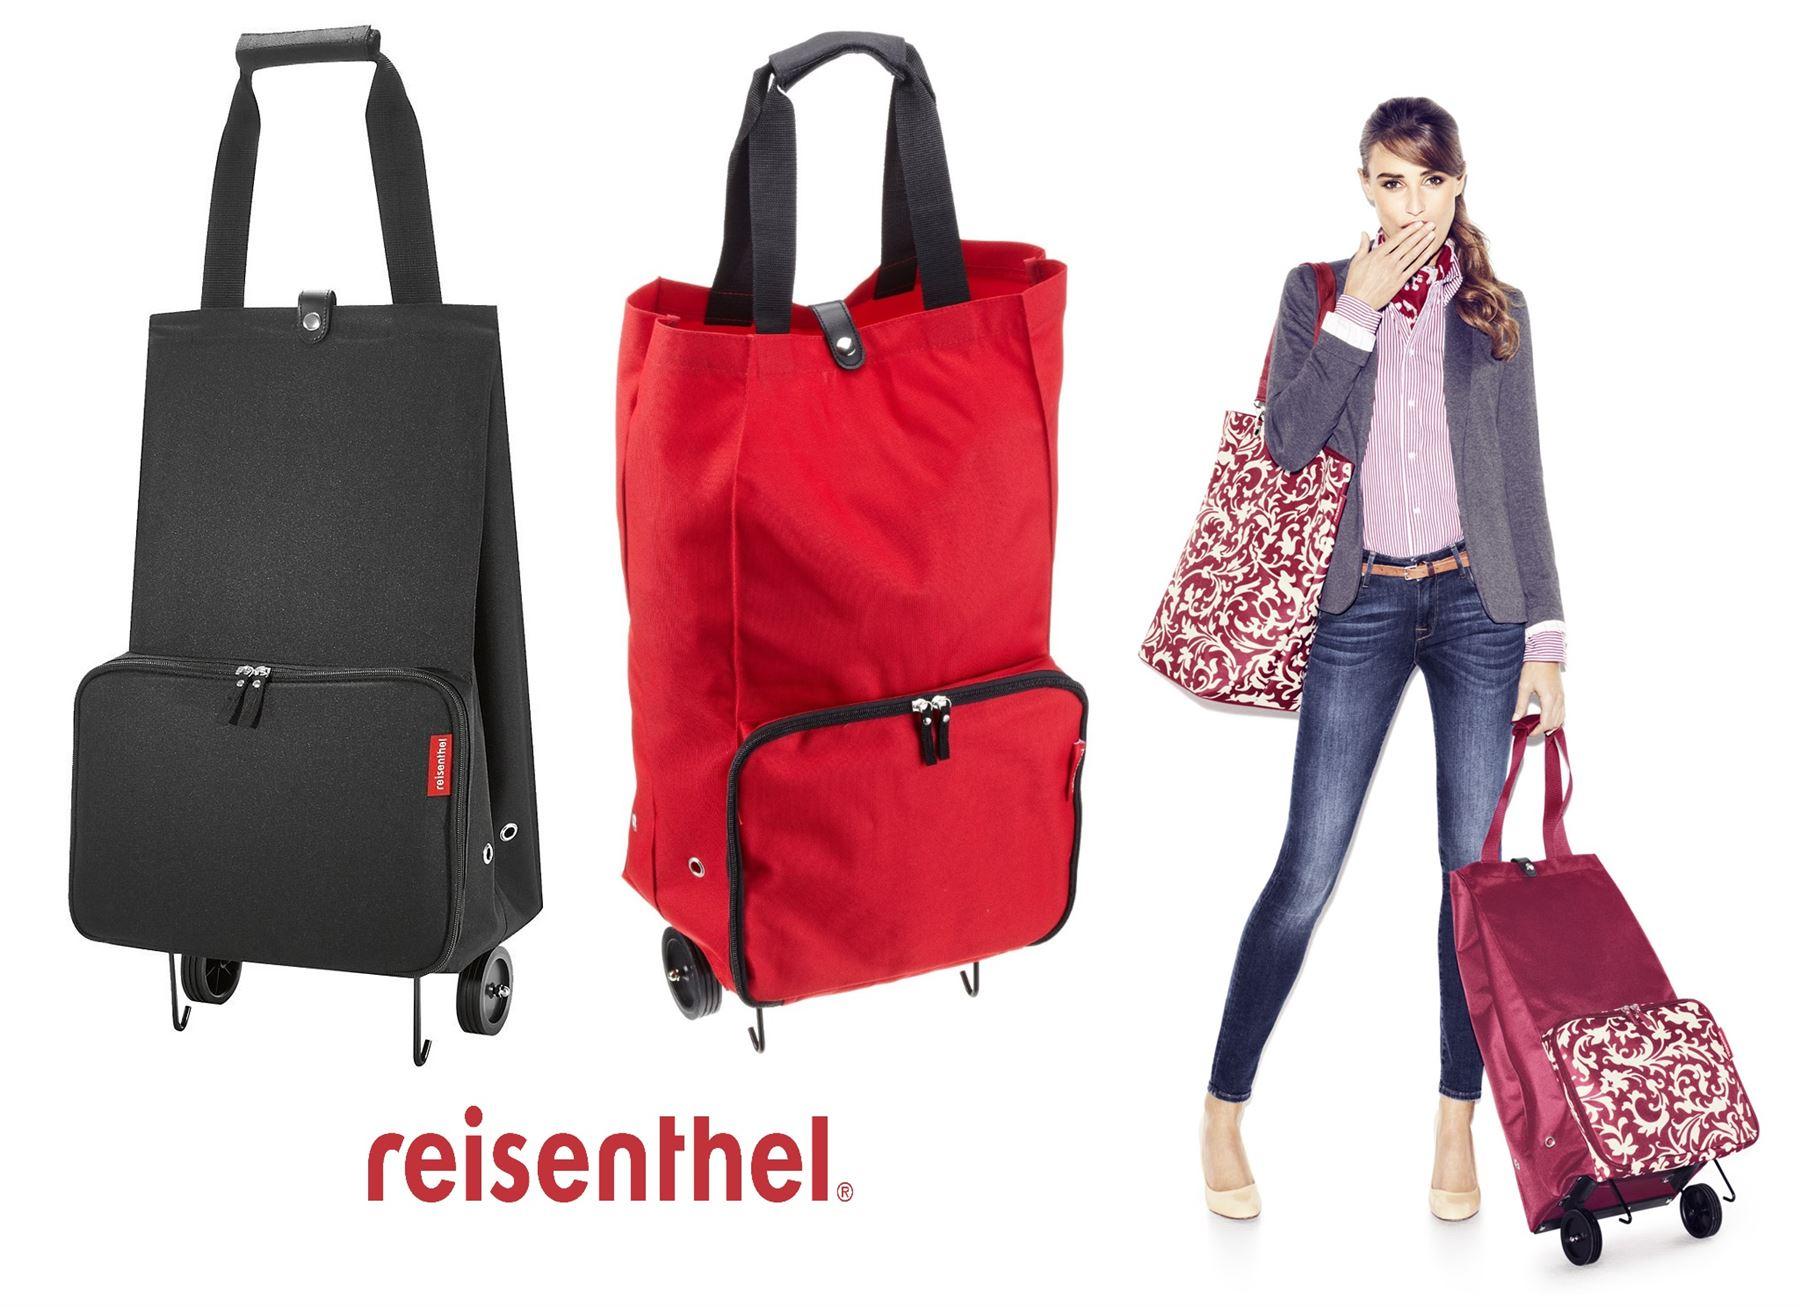 Reisenthel Foldable Trolley Shopping Bag In Various